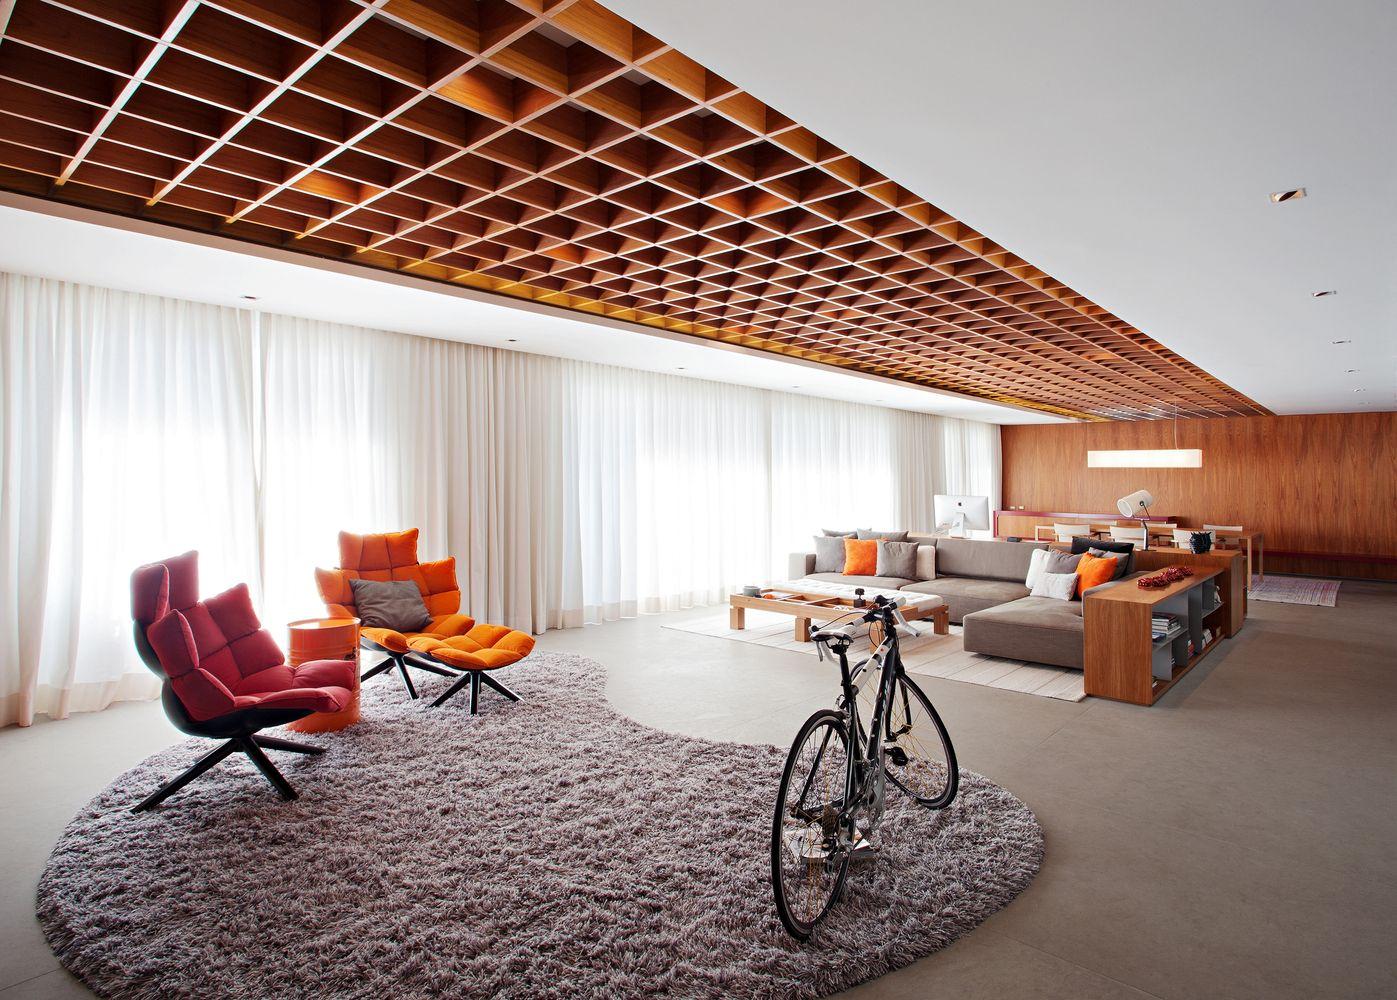 Gallery of Jardim Europa Apartment PerkinsWill